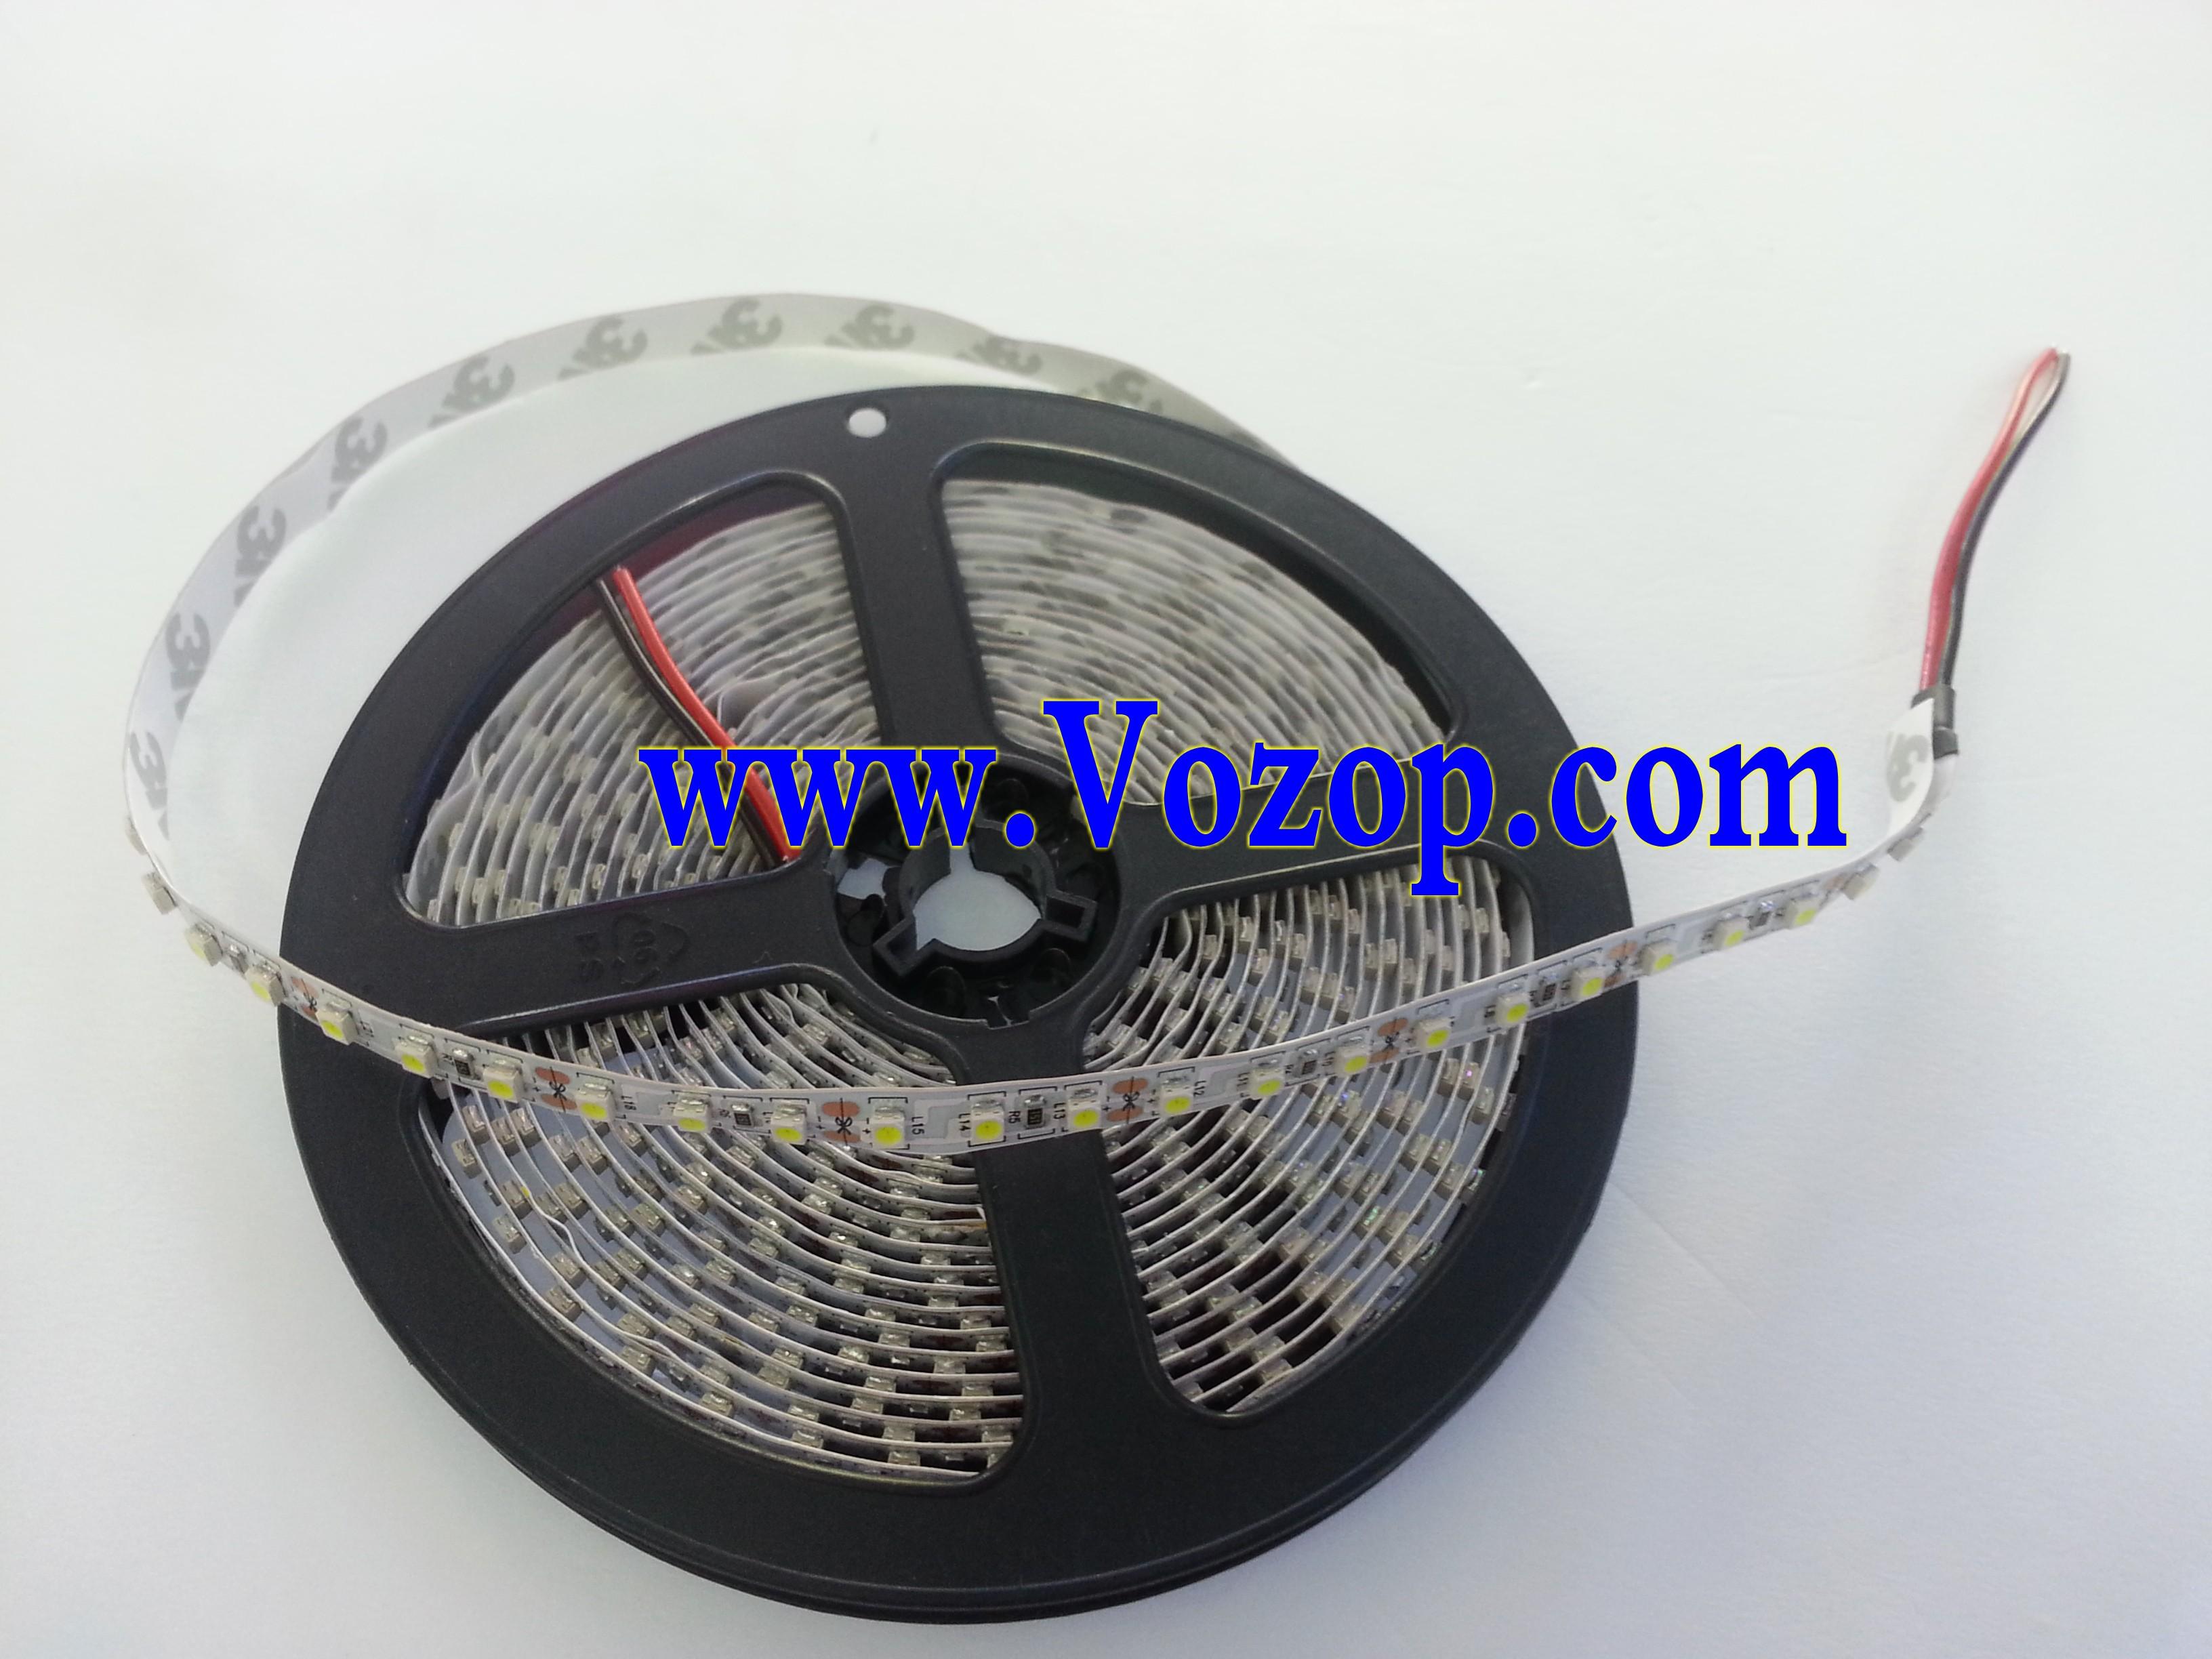 SMD3528_LED_Strip_light_5M_600_LEDs_Non_Waterproof_Light